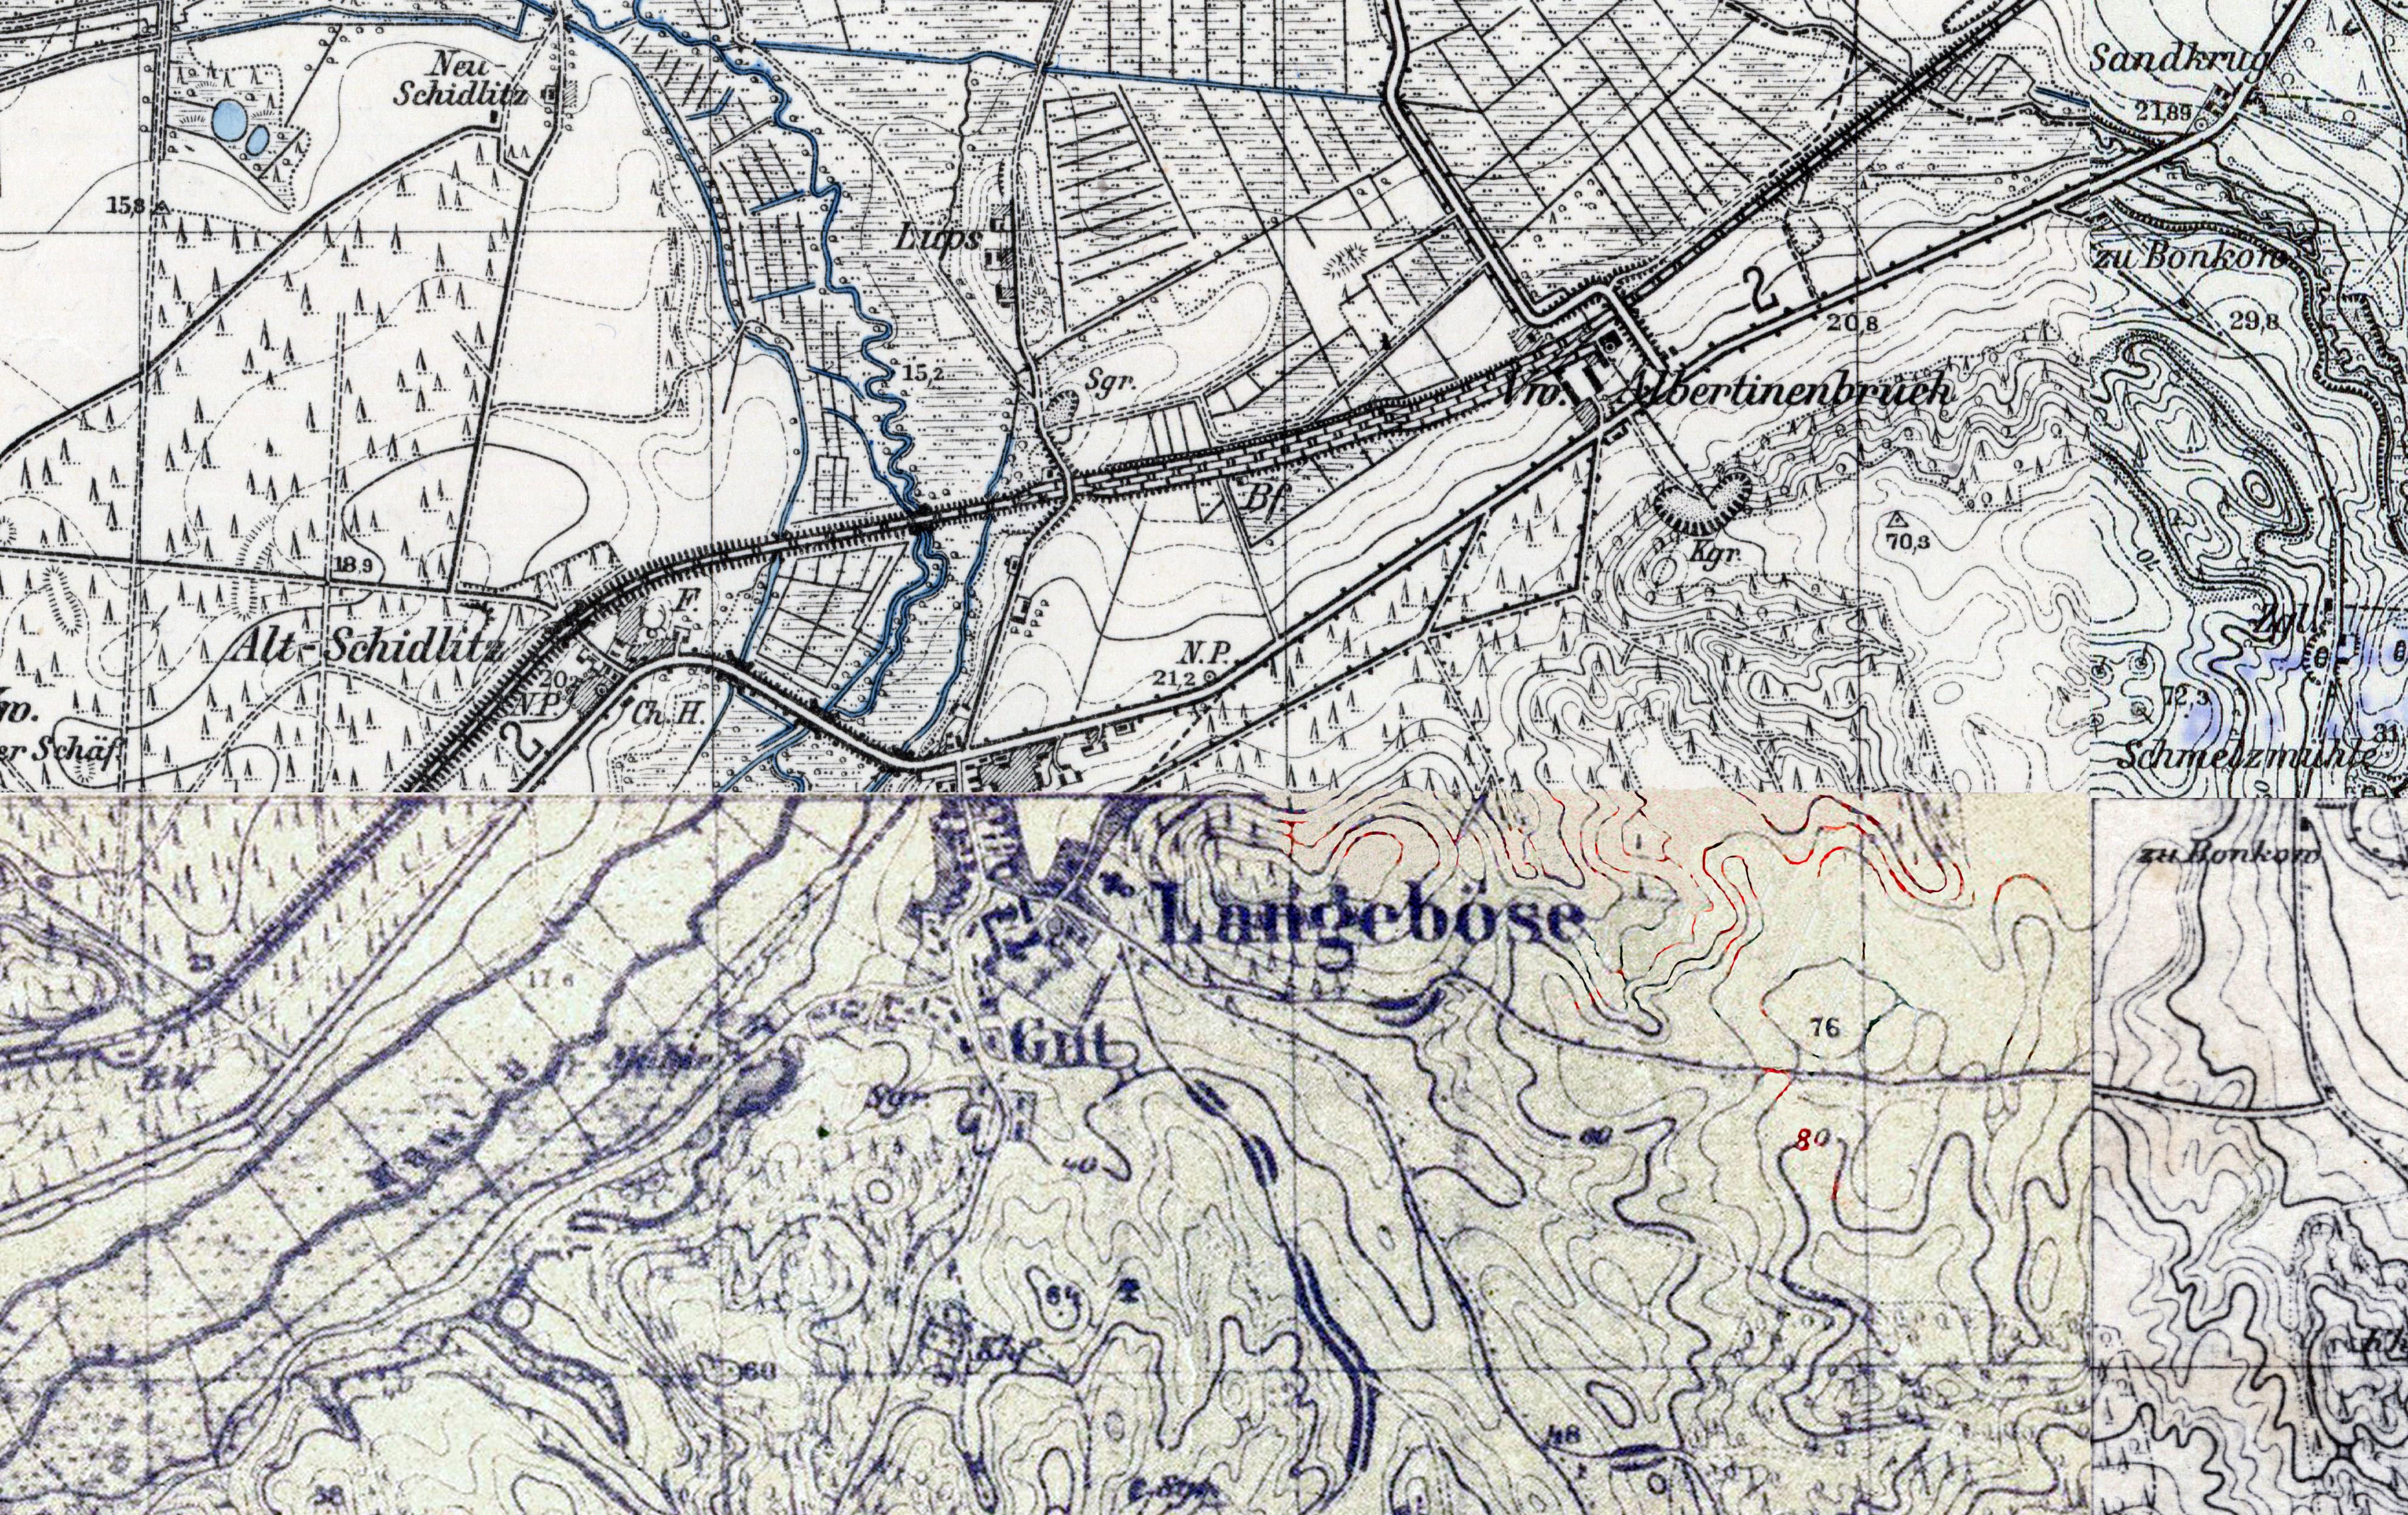 Langeböse - 1937